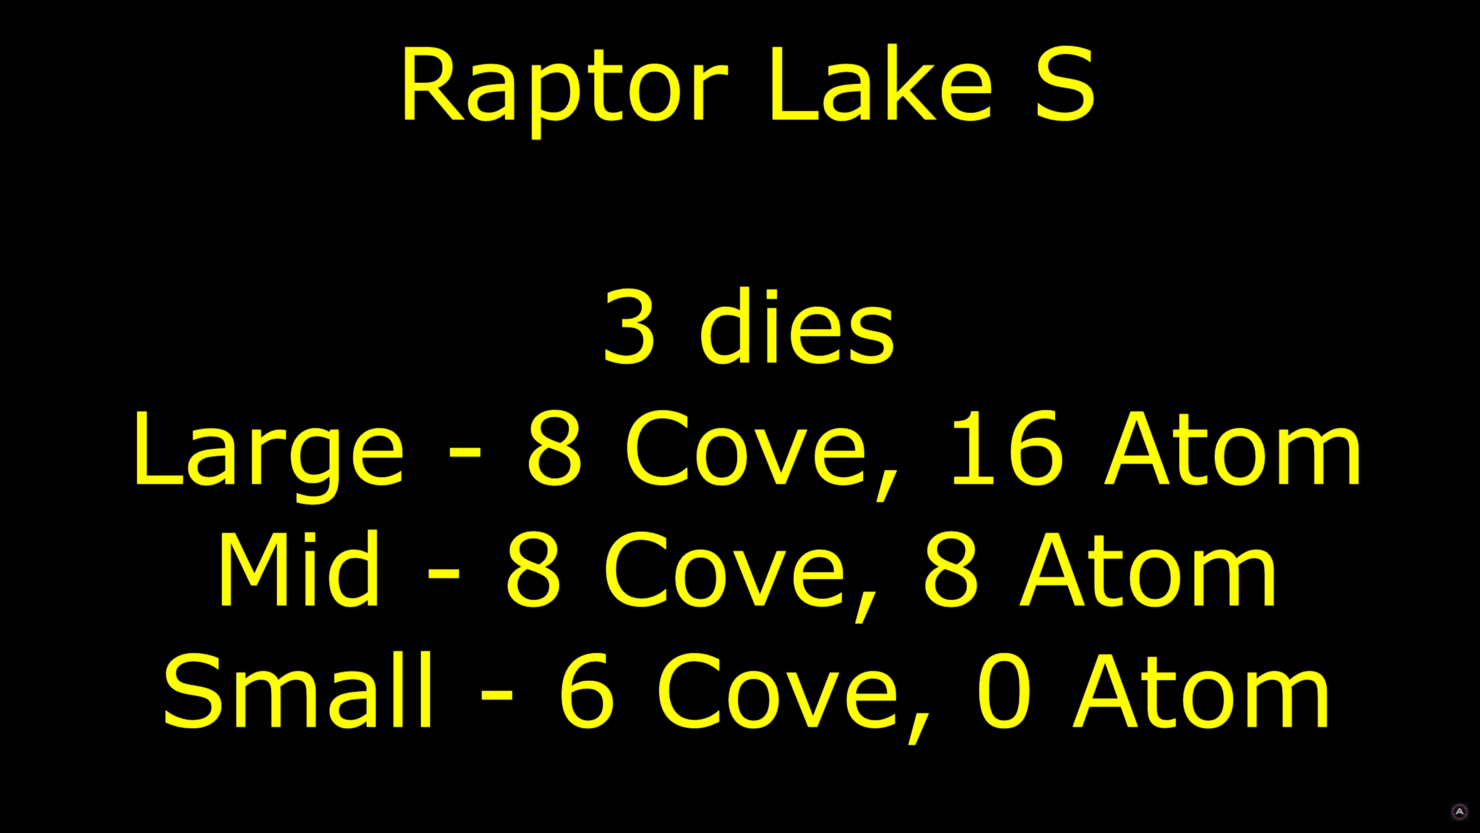 intel-raptor-lake-s-desktop-cpus-13th-gen-core-family-with-raptor-cove-cores-_1